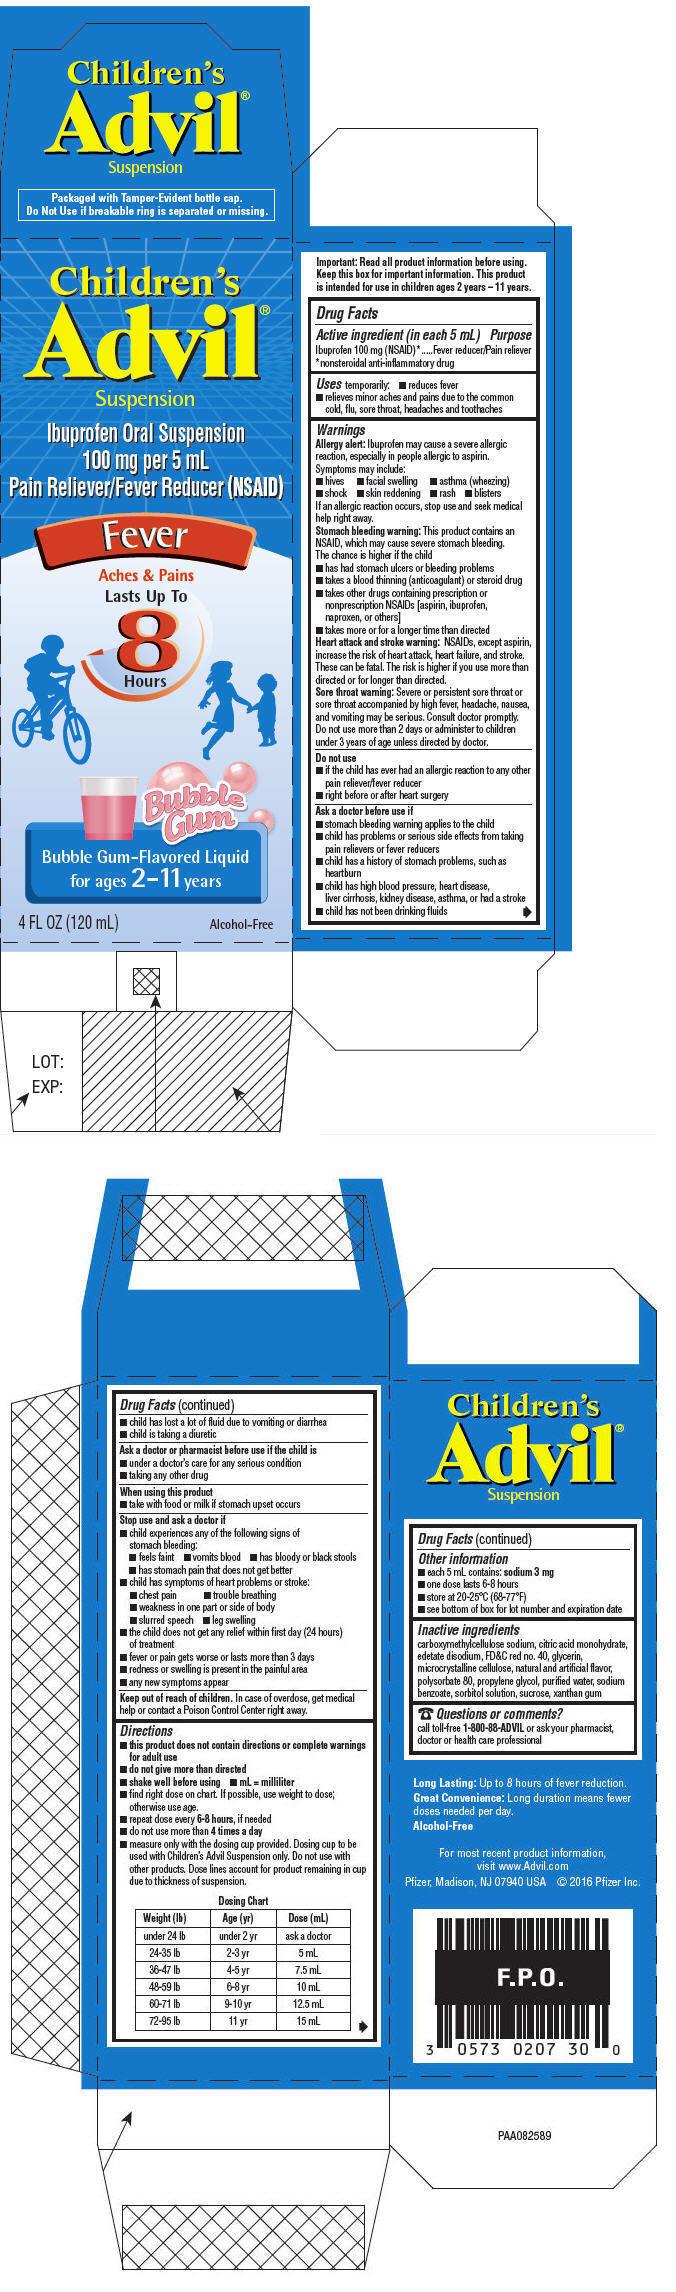 PRINCIPAL DISPLAY PANEL - 120 mL Bottle Carton - Bubble Gum-Flavored